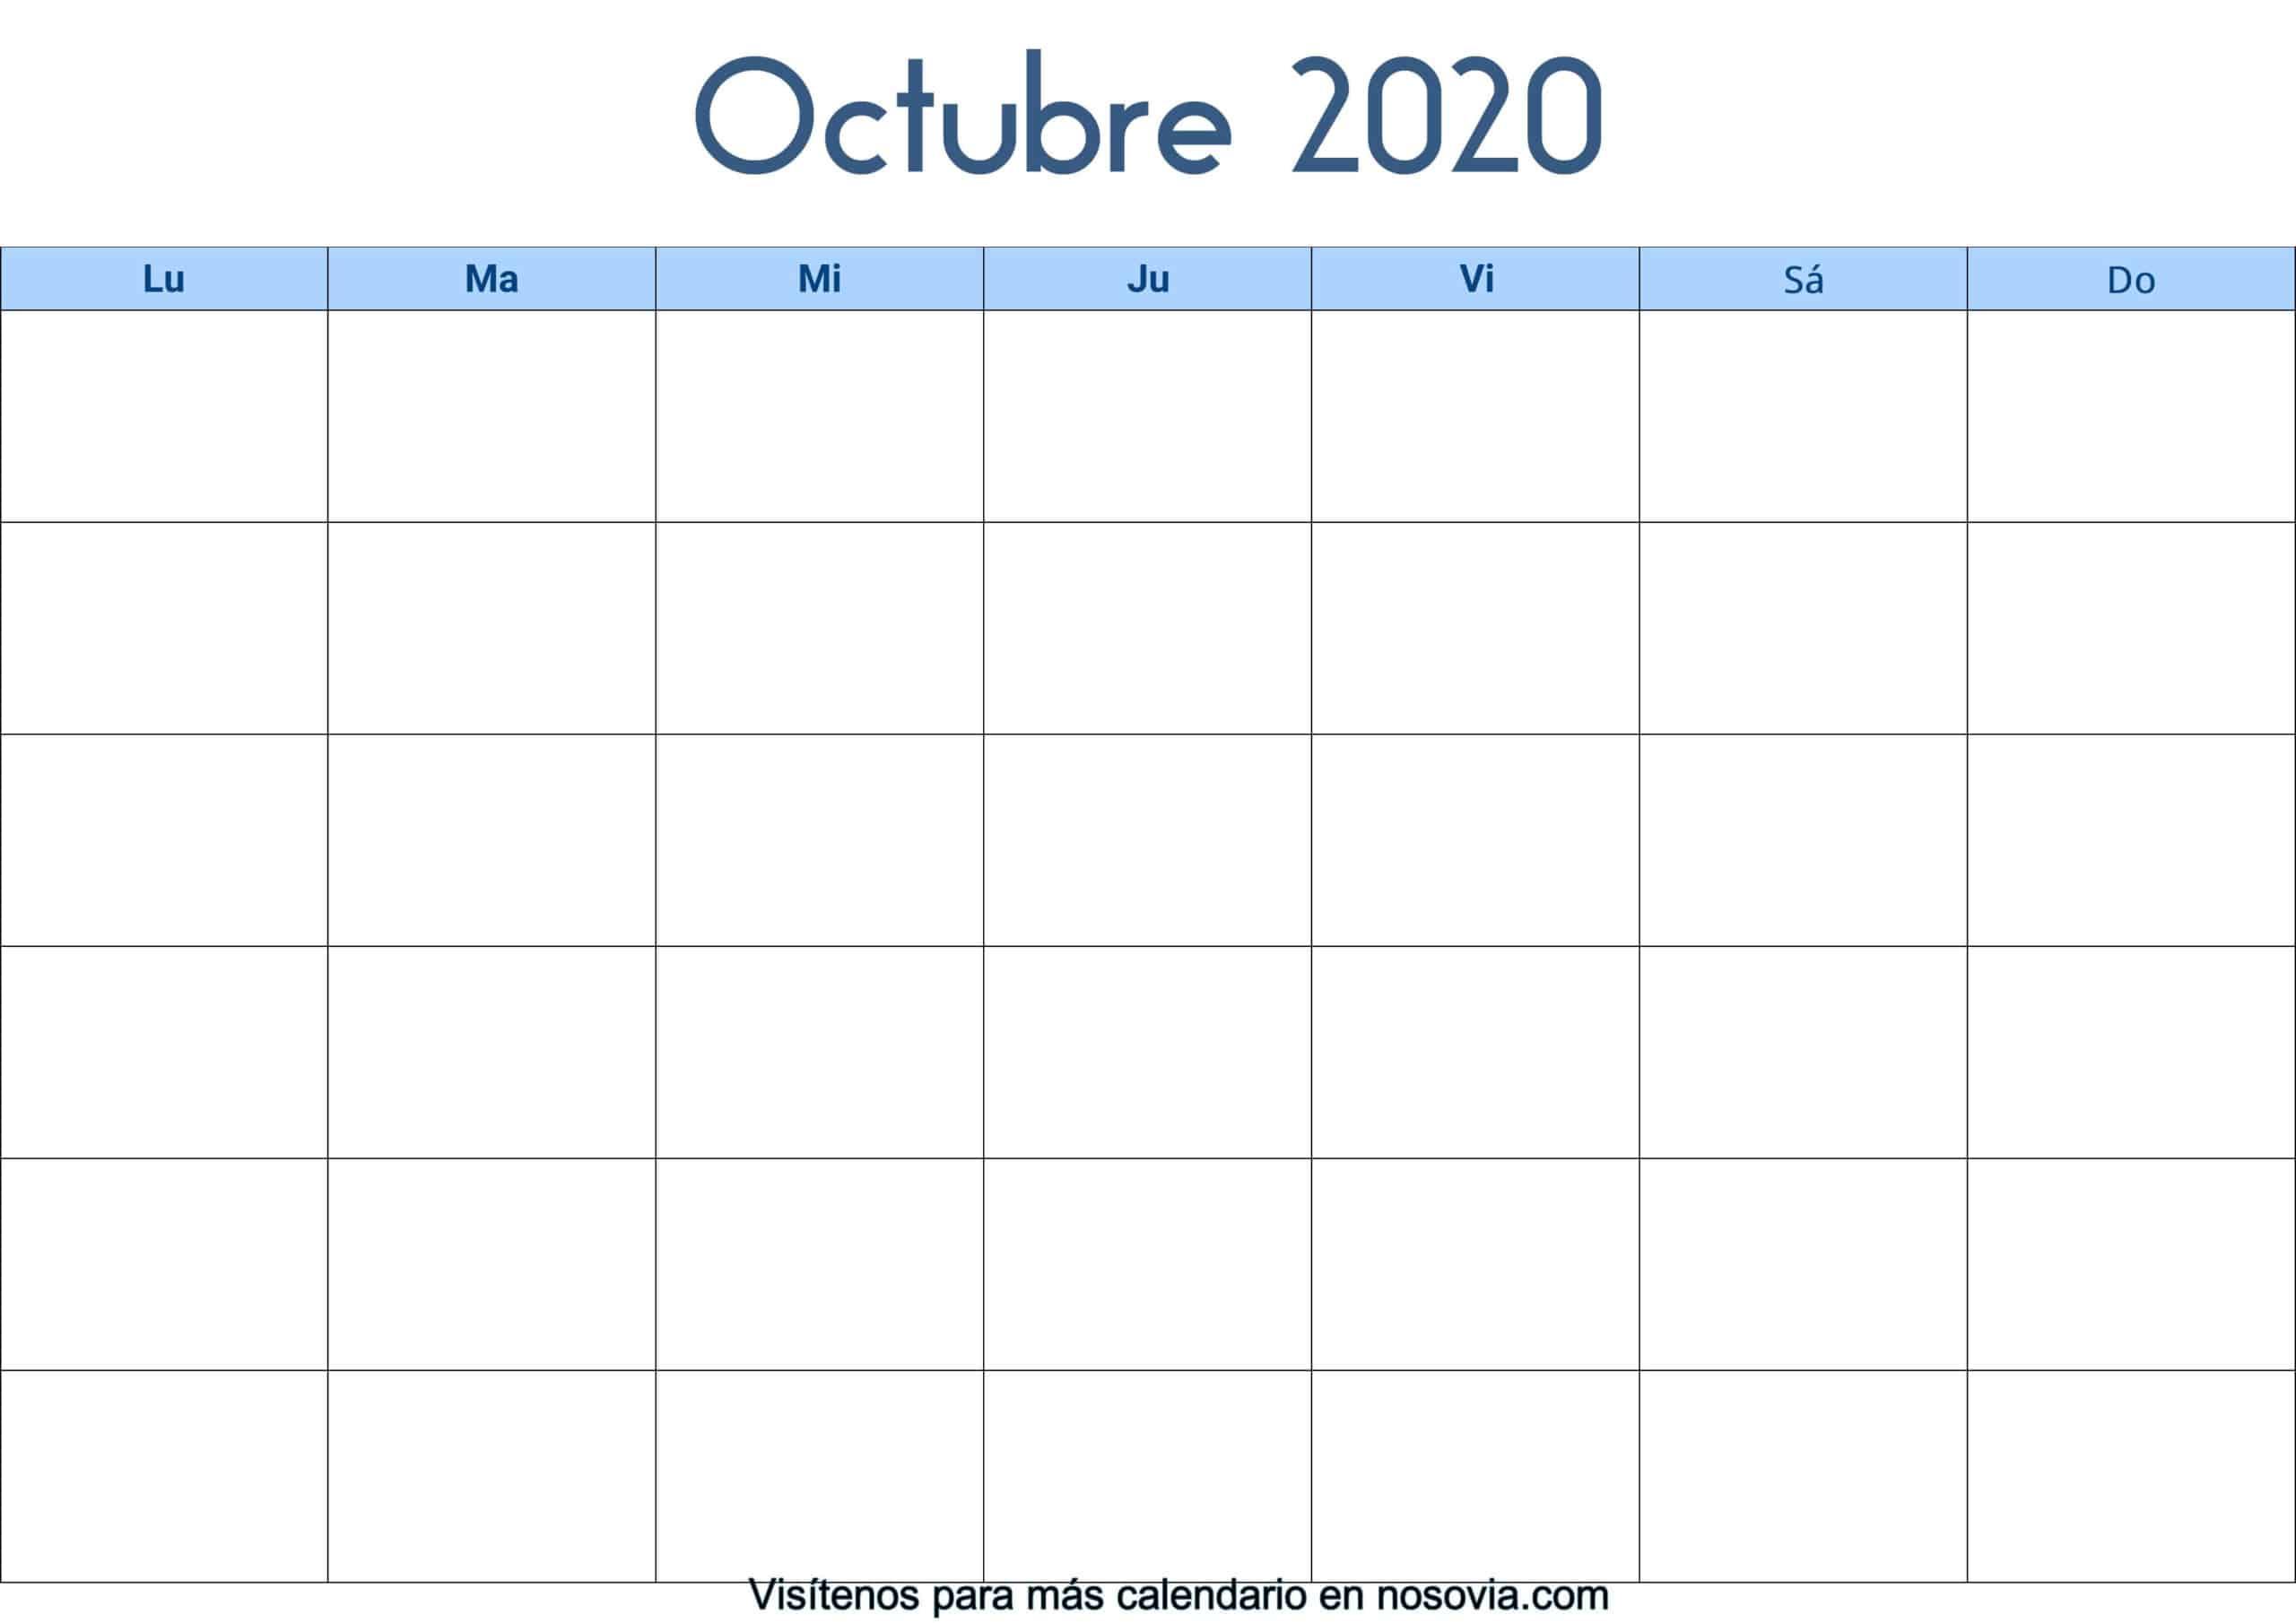 Calendario-octubre-2020-en-blanco-Palabra-gratis